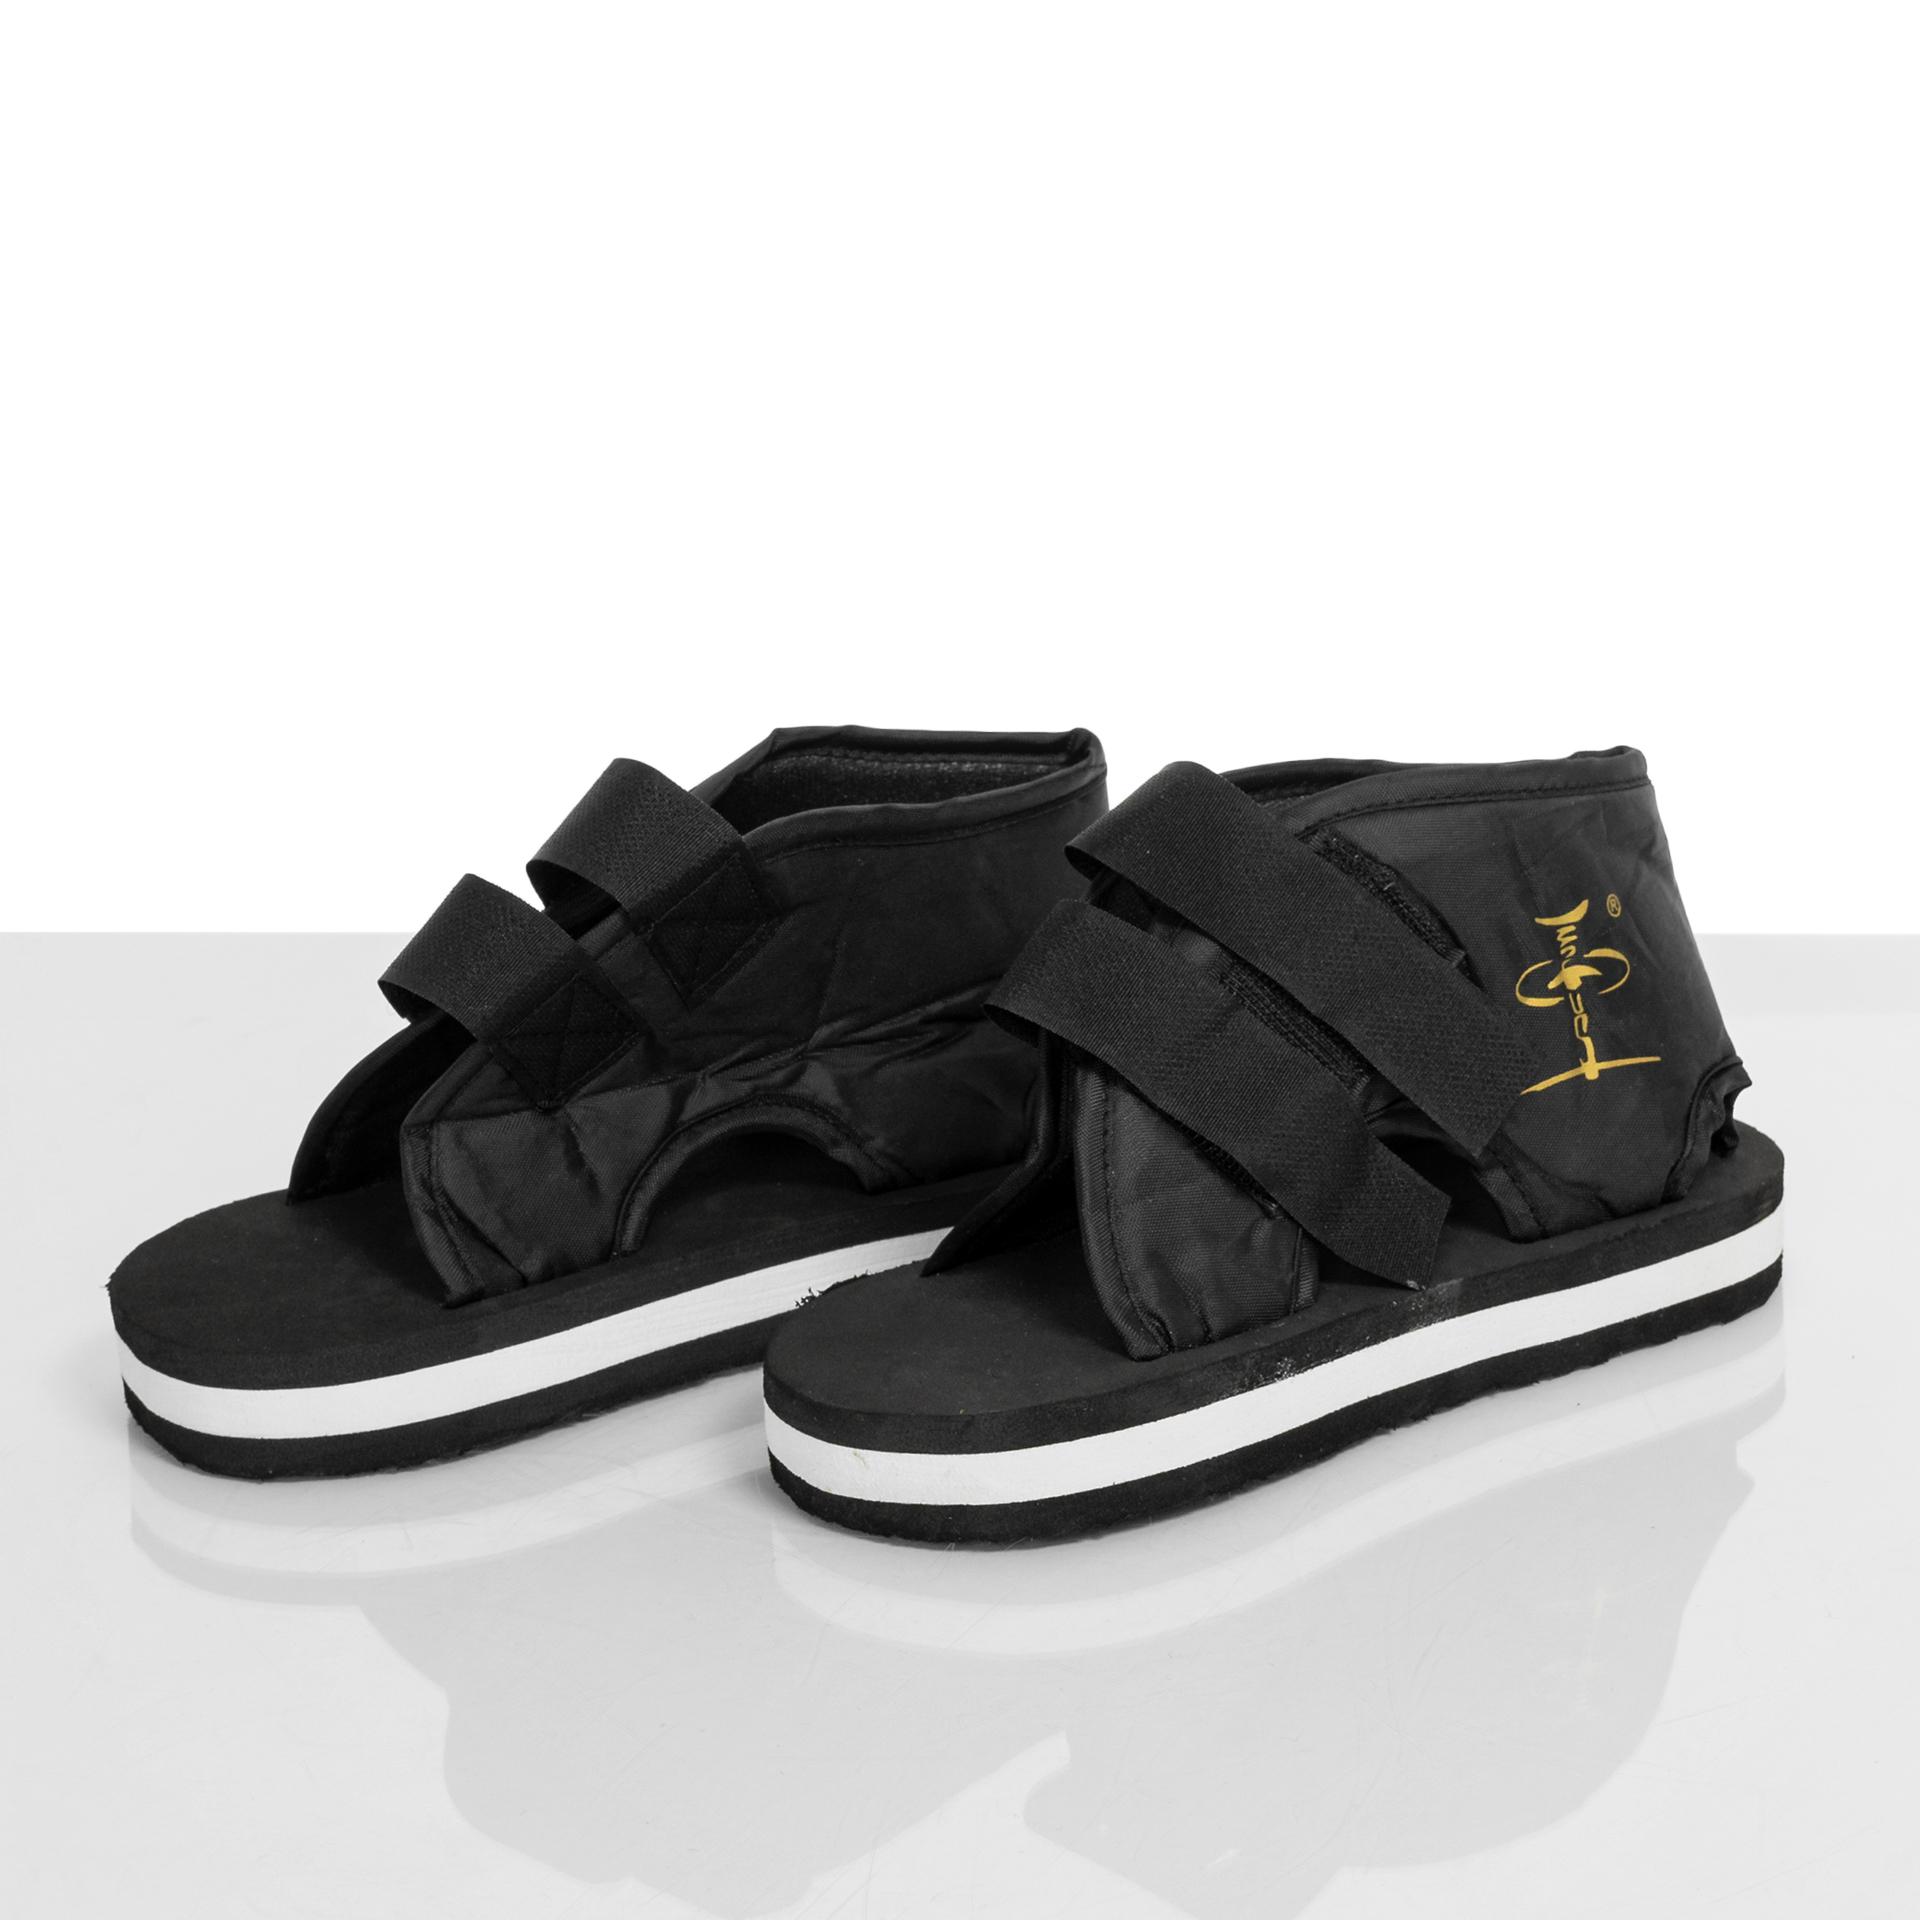 Activator-Schuhe